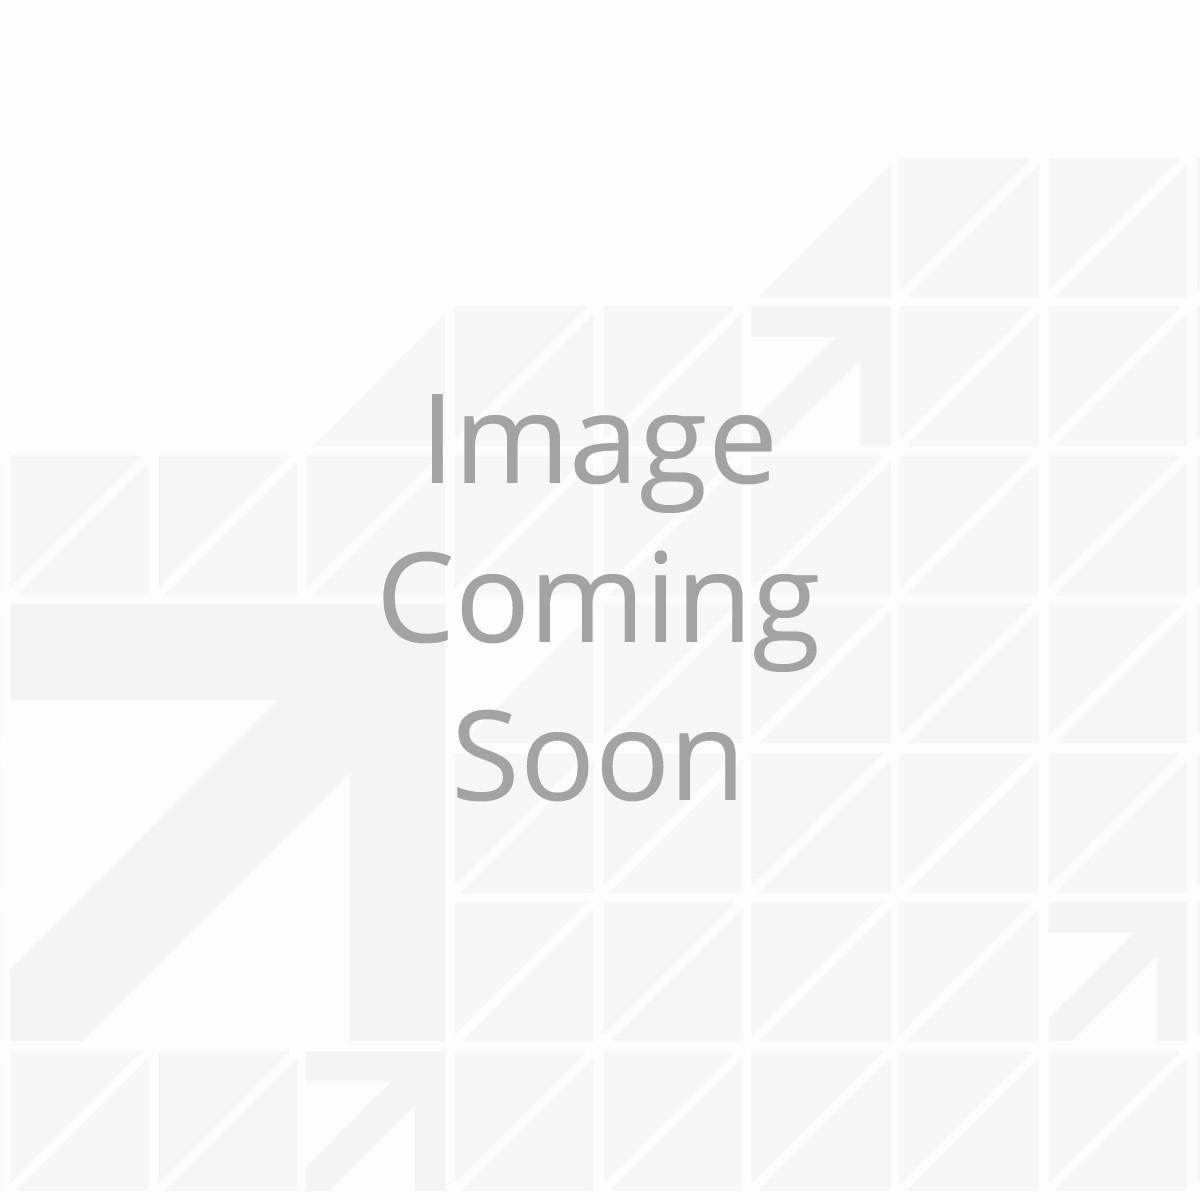 Gear Motor Assembly - Single Shaft (High Torque)